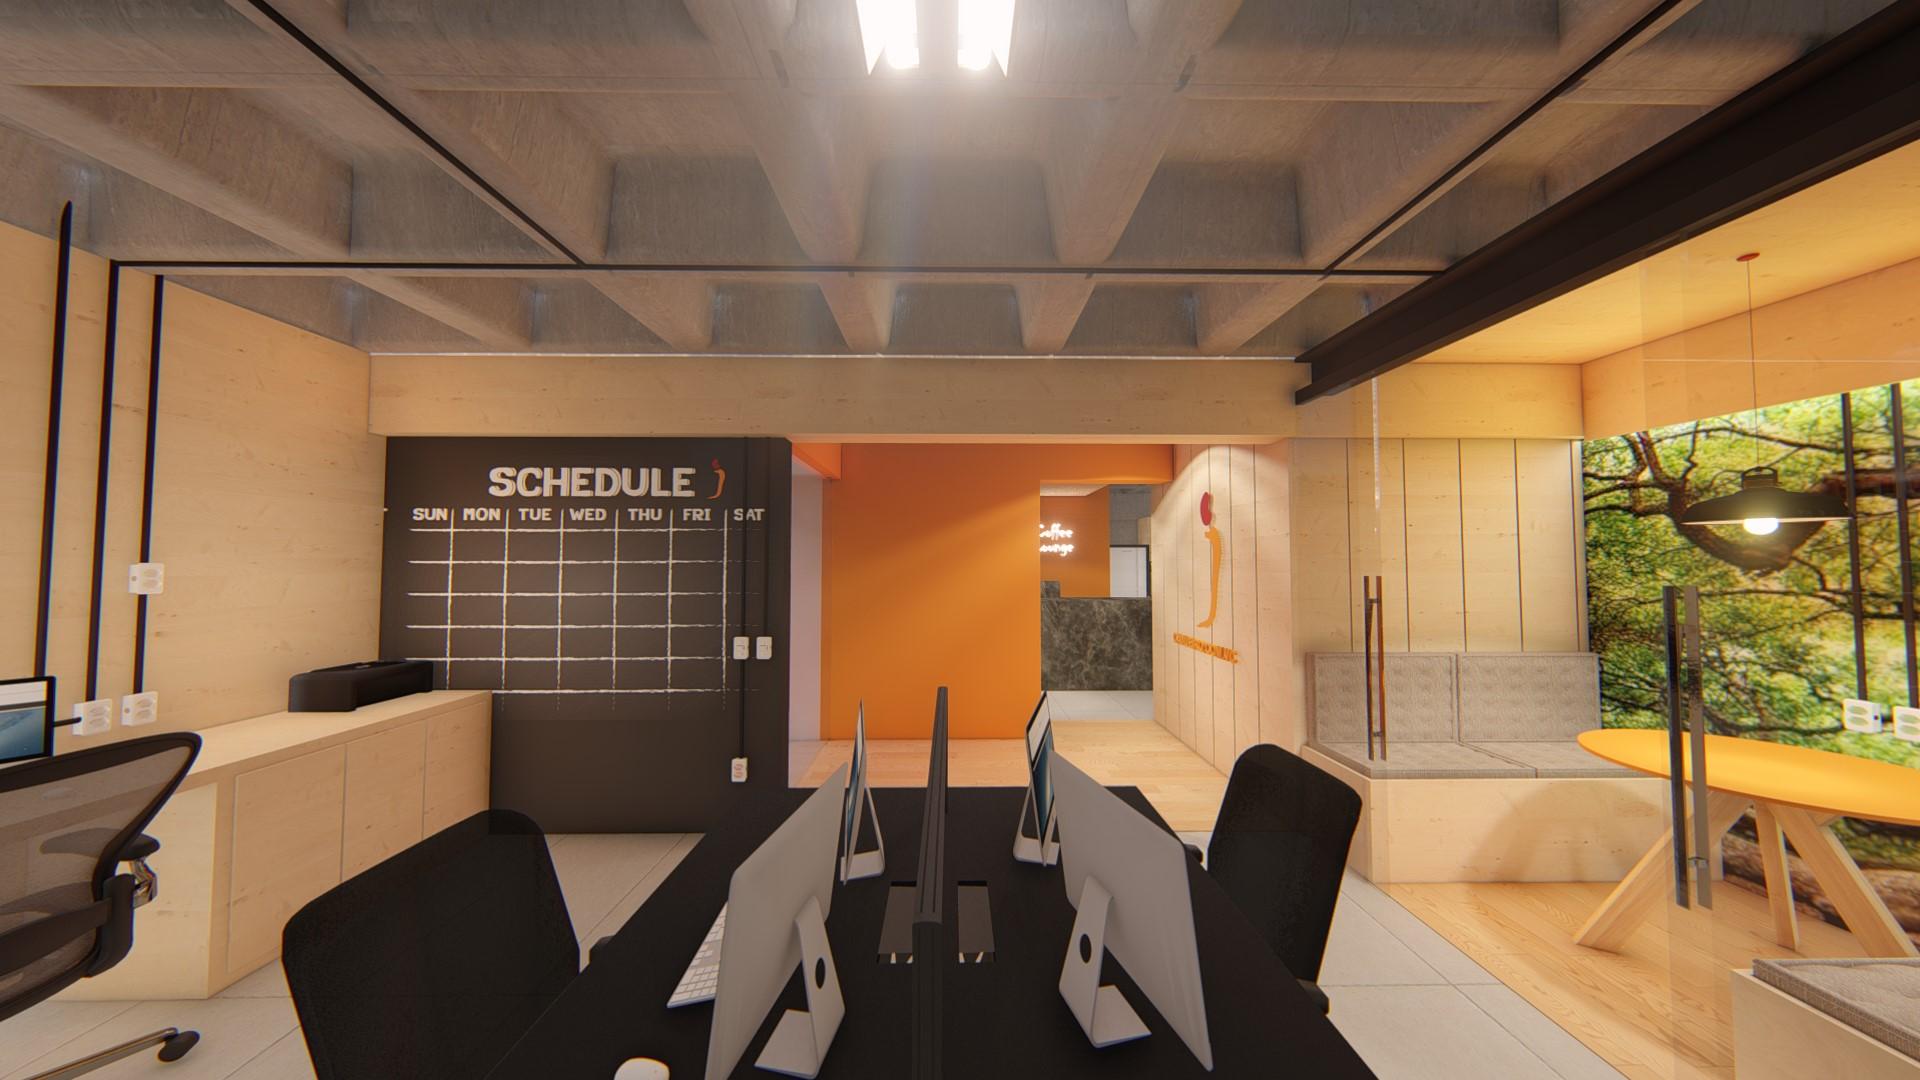 projeto-arquitetonico-cajueiro-duo-arquitetura-029.jpg